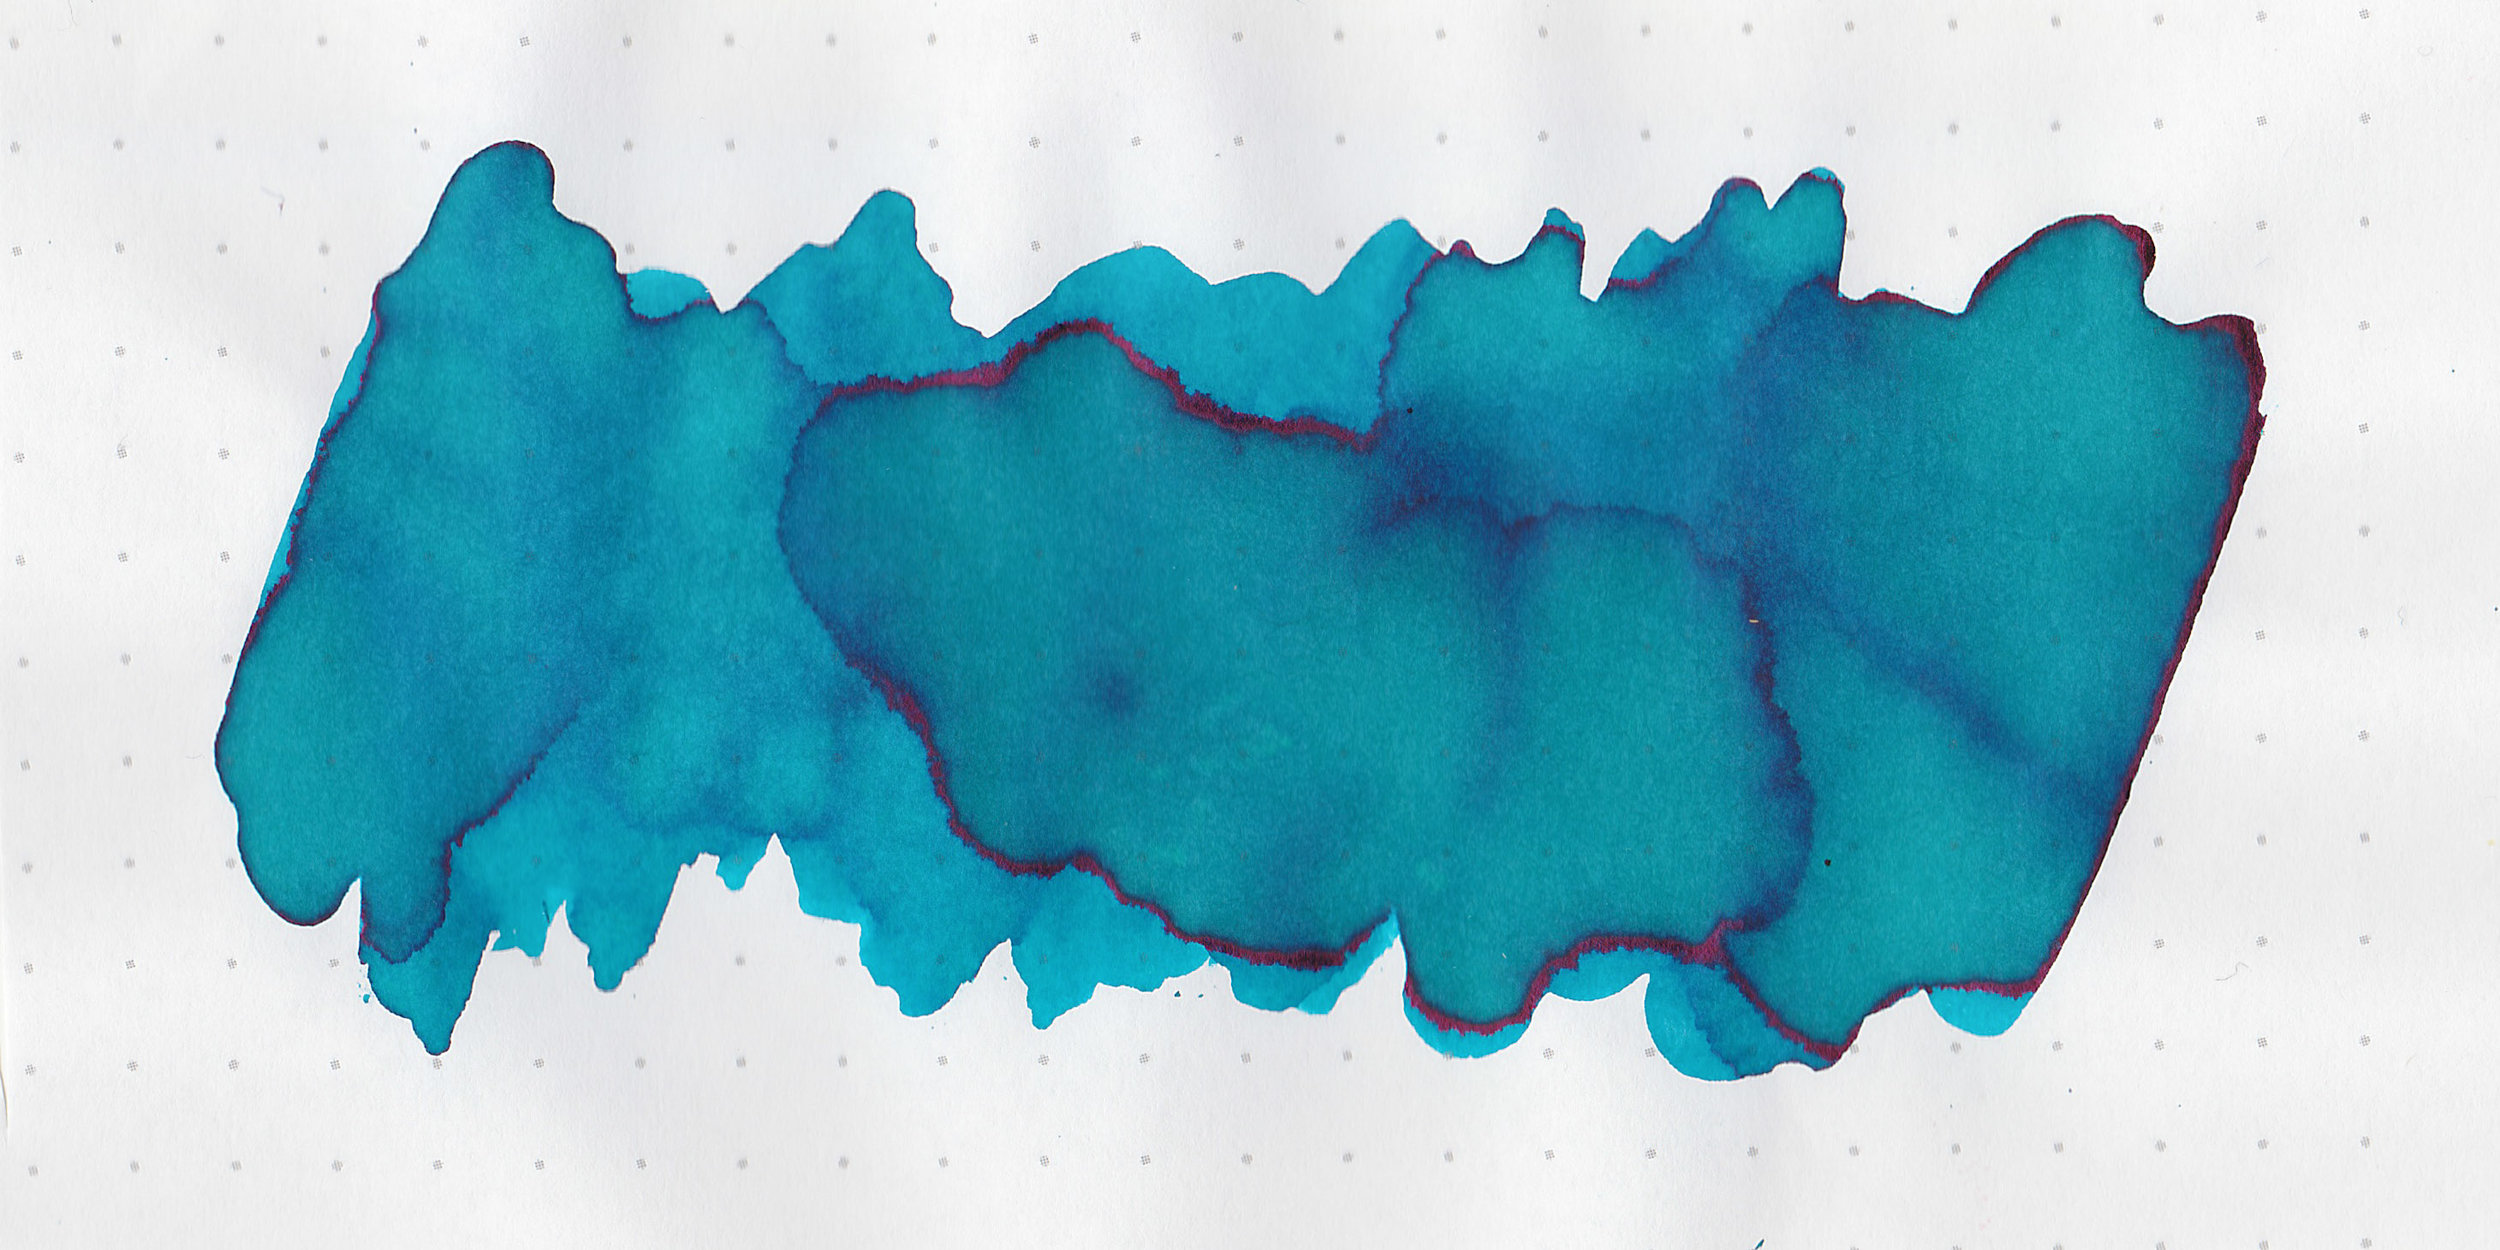 ro-clearwater-rain-6.jpg